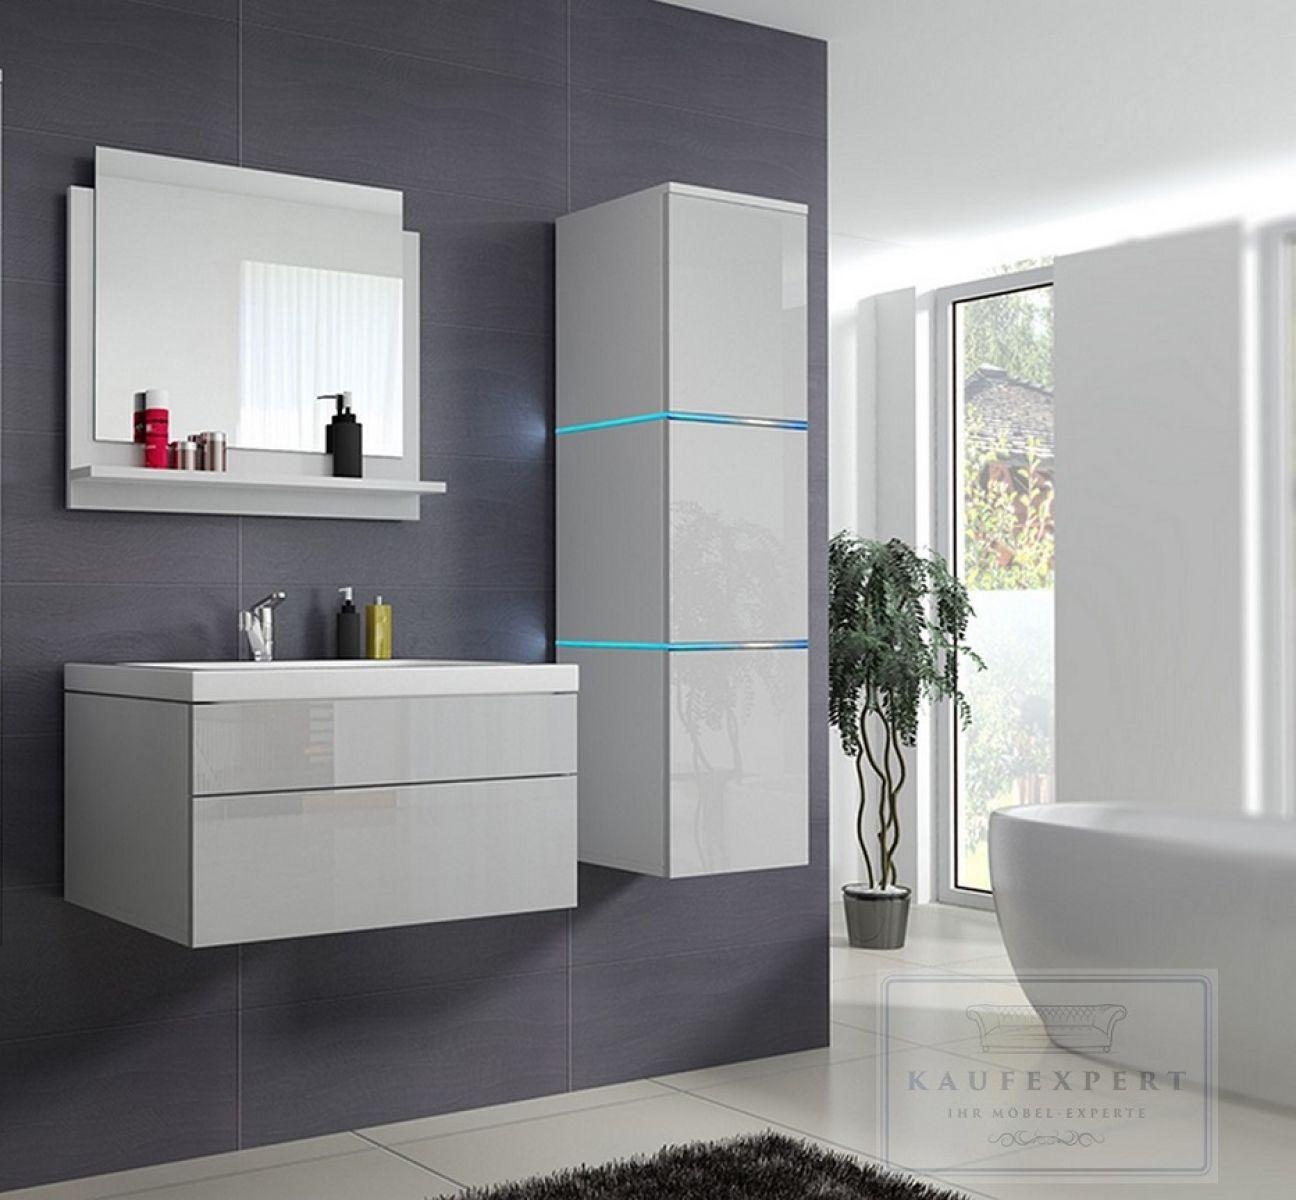 Badezimmer Beleuchtung Lux Badezimmerbeleuchtung Badezimmer Spiegelschrank Mit Beleuchtung Badezimmer